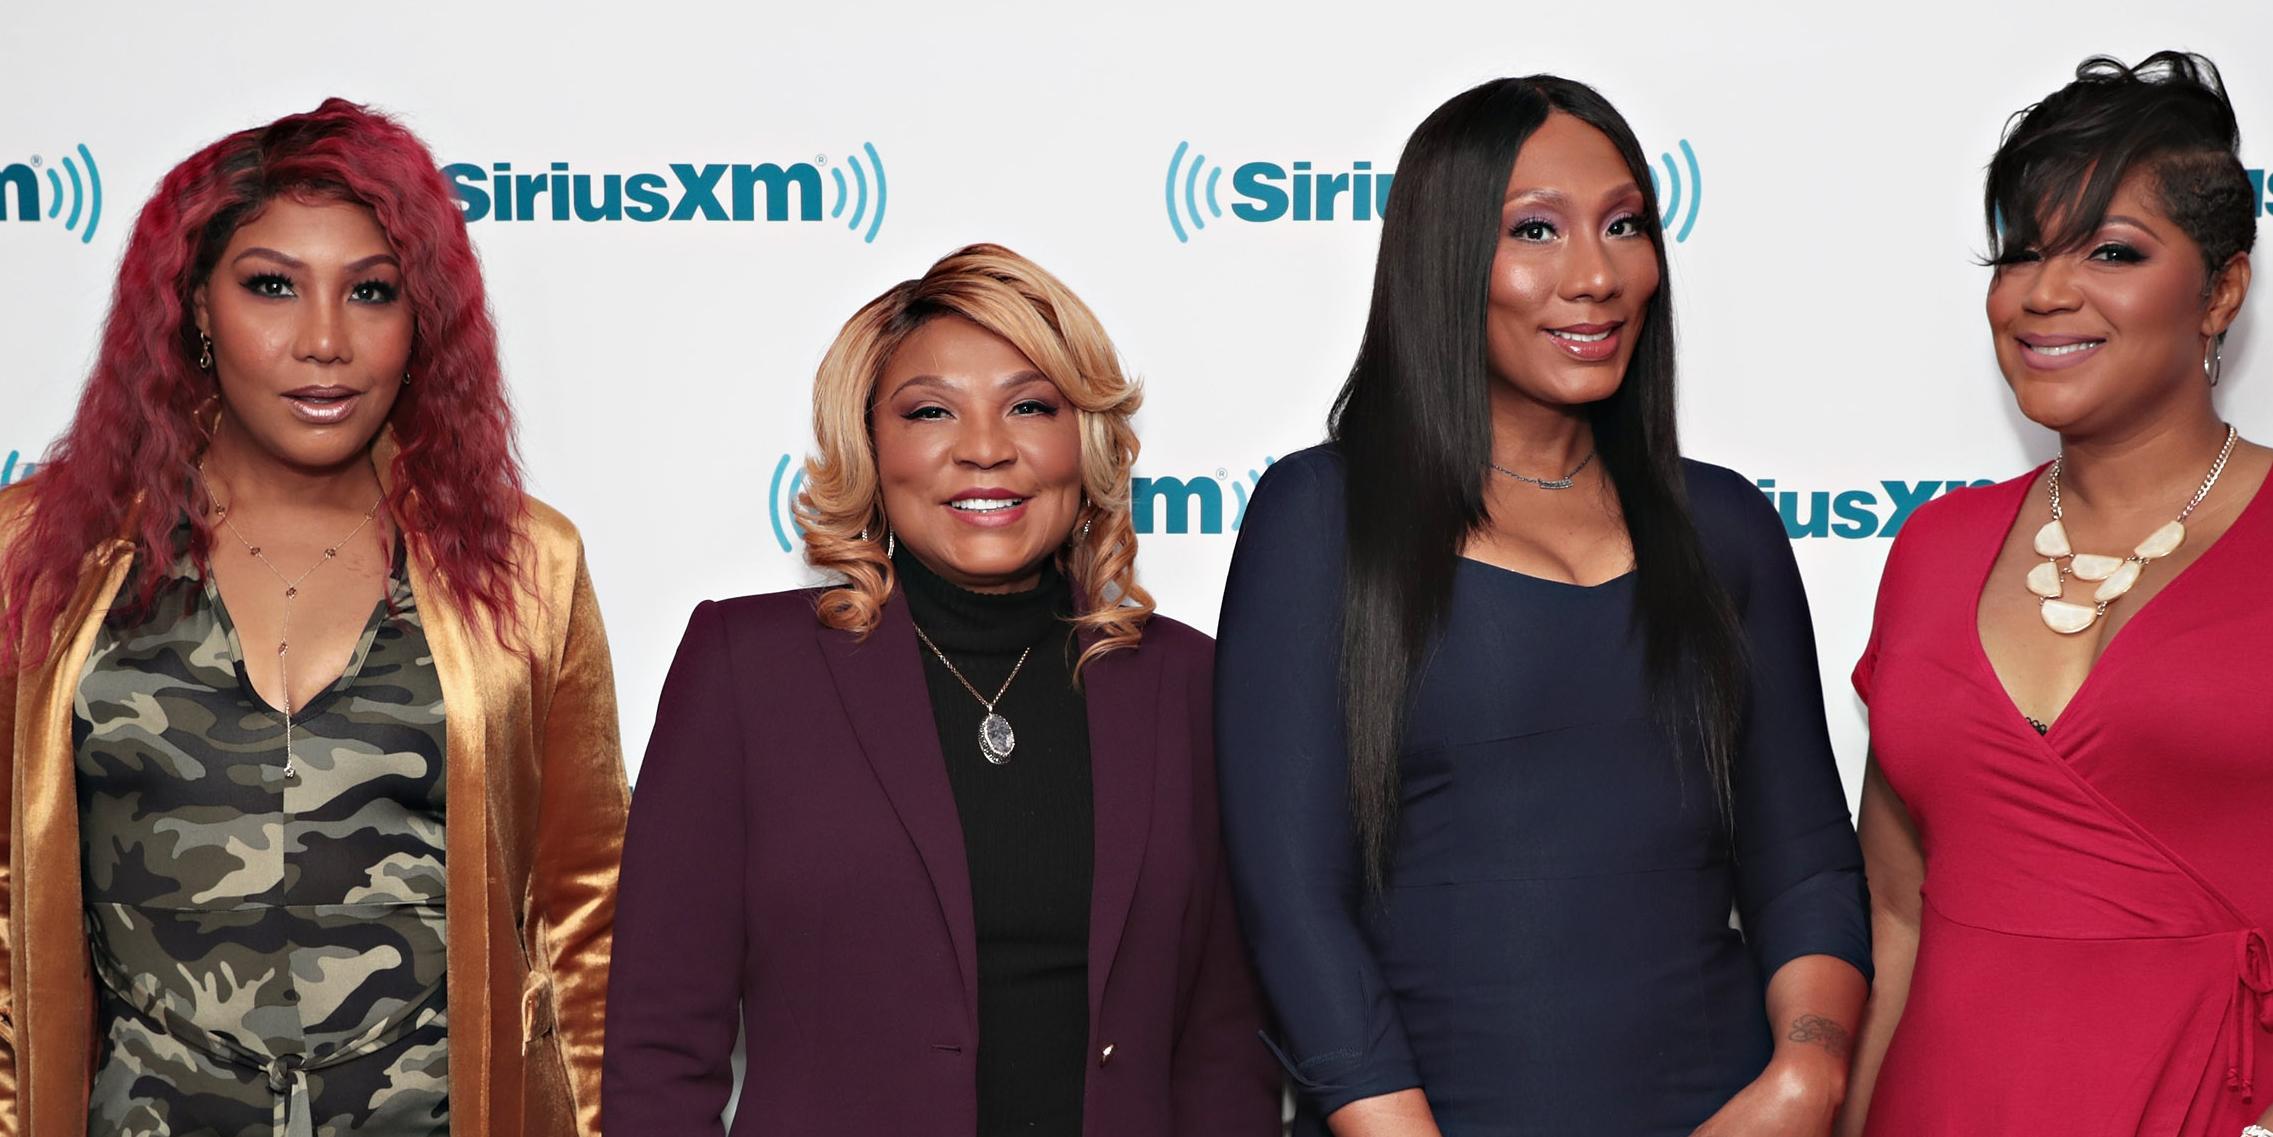 Celebrities Visit SiriusXM – March 22, 2018